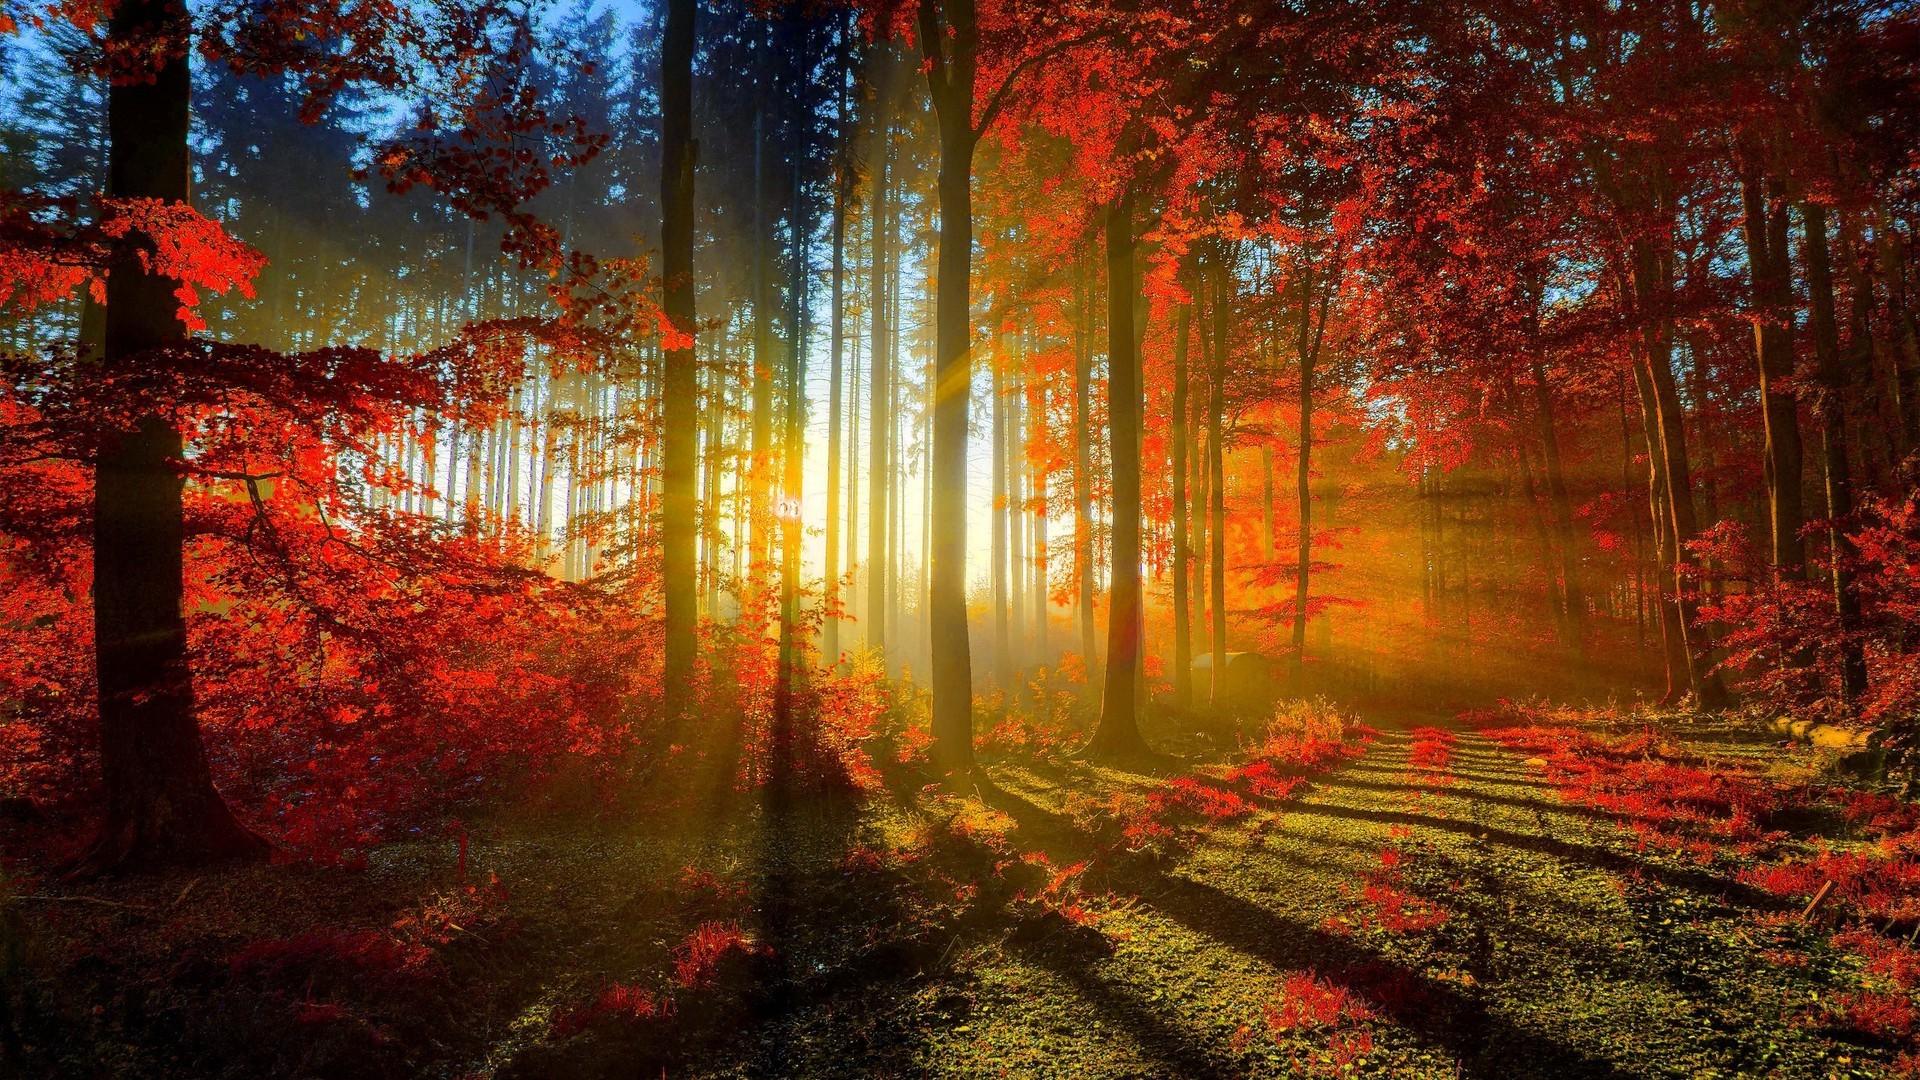 Beautiful Nature Hd Wallpapers  Download 15863 Wallpaper 1920x1080